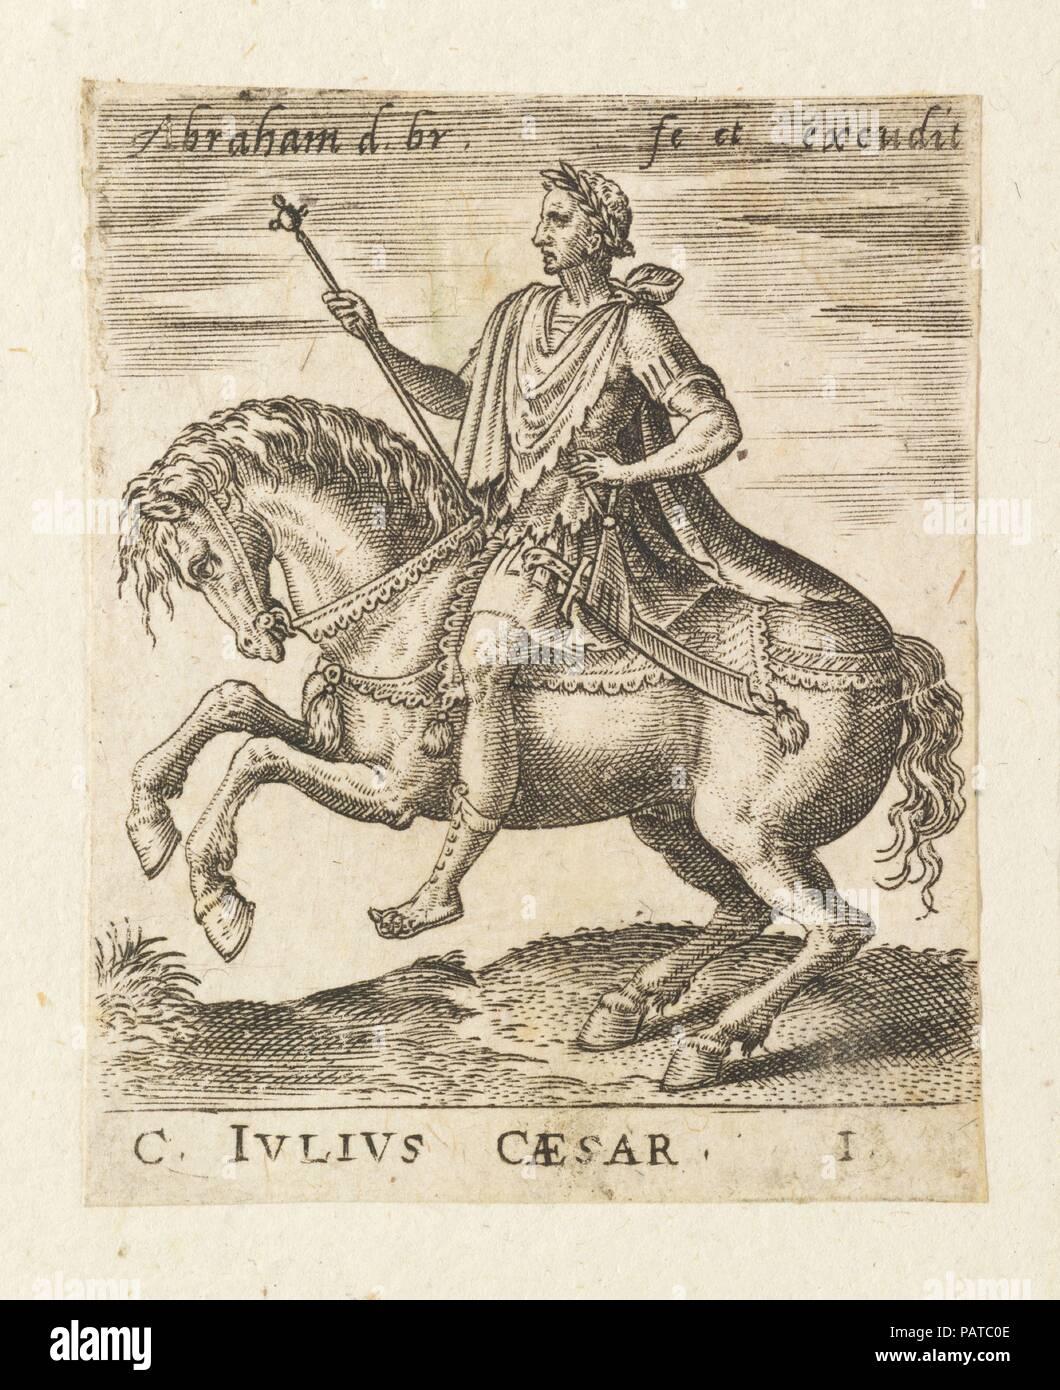 C. Julius Caesar from Twelve Caesars on Horseback. Artist: Abraham de Bruyn (Flemish, Antwerp 1540-1587 Cologne (?)). Dimensions: Sheet: 2 5/16 × 1 13/16 in. (5.8 × 4.6 cm). Date: ca. 1565-1587. Museum: Metropolitan Museum of Art, New York, USA. Stock Photo